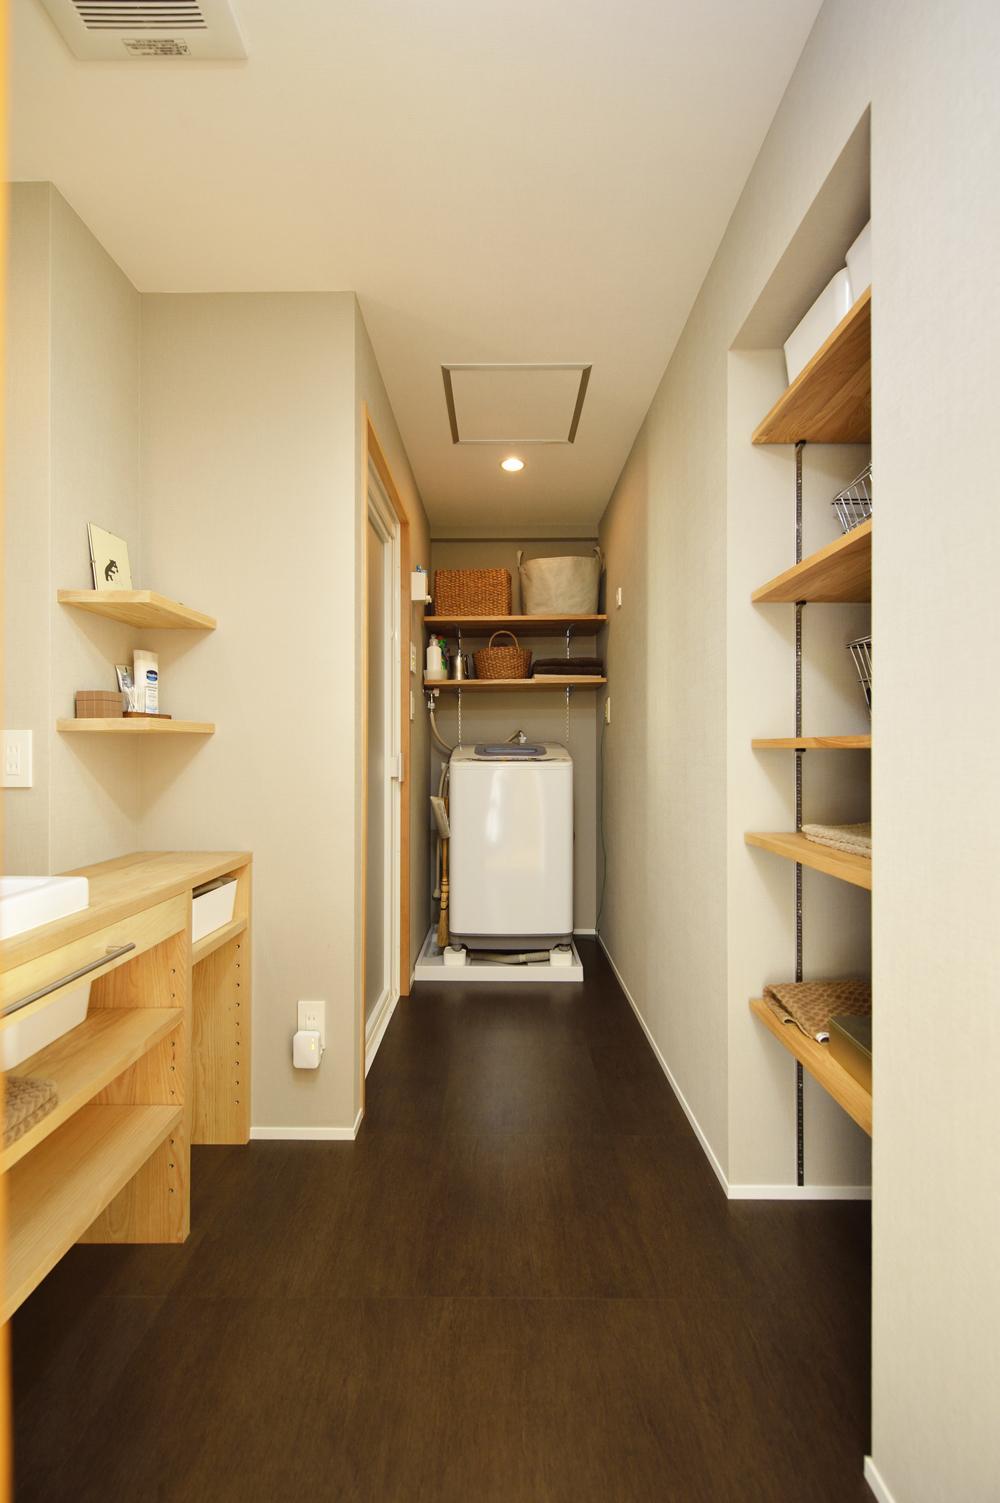 K邸・暮しを彩る収納のある家の部屋 洗面室-ランドリースペース